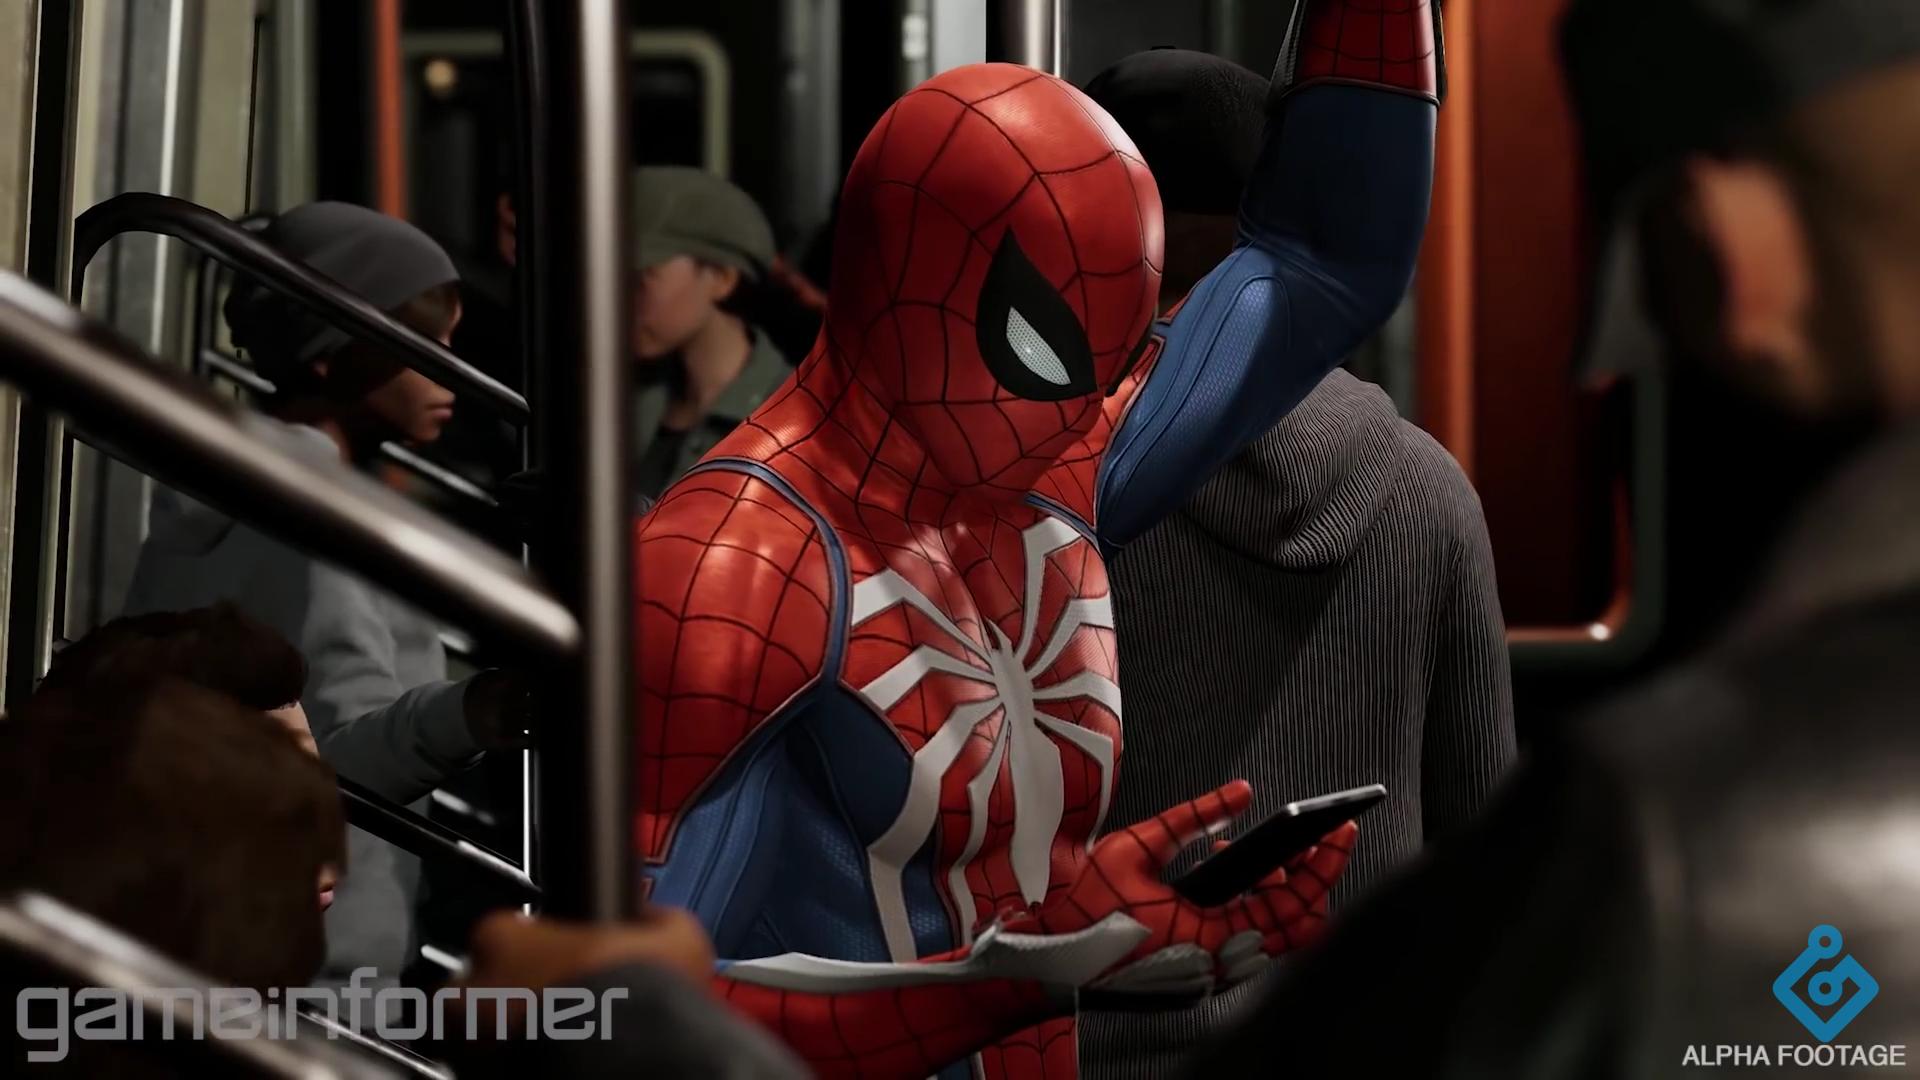 [Image]My favourite new Spiderman screenshot Spiderman